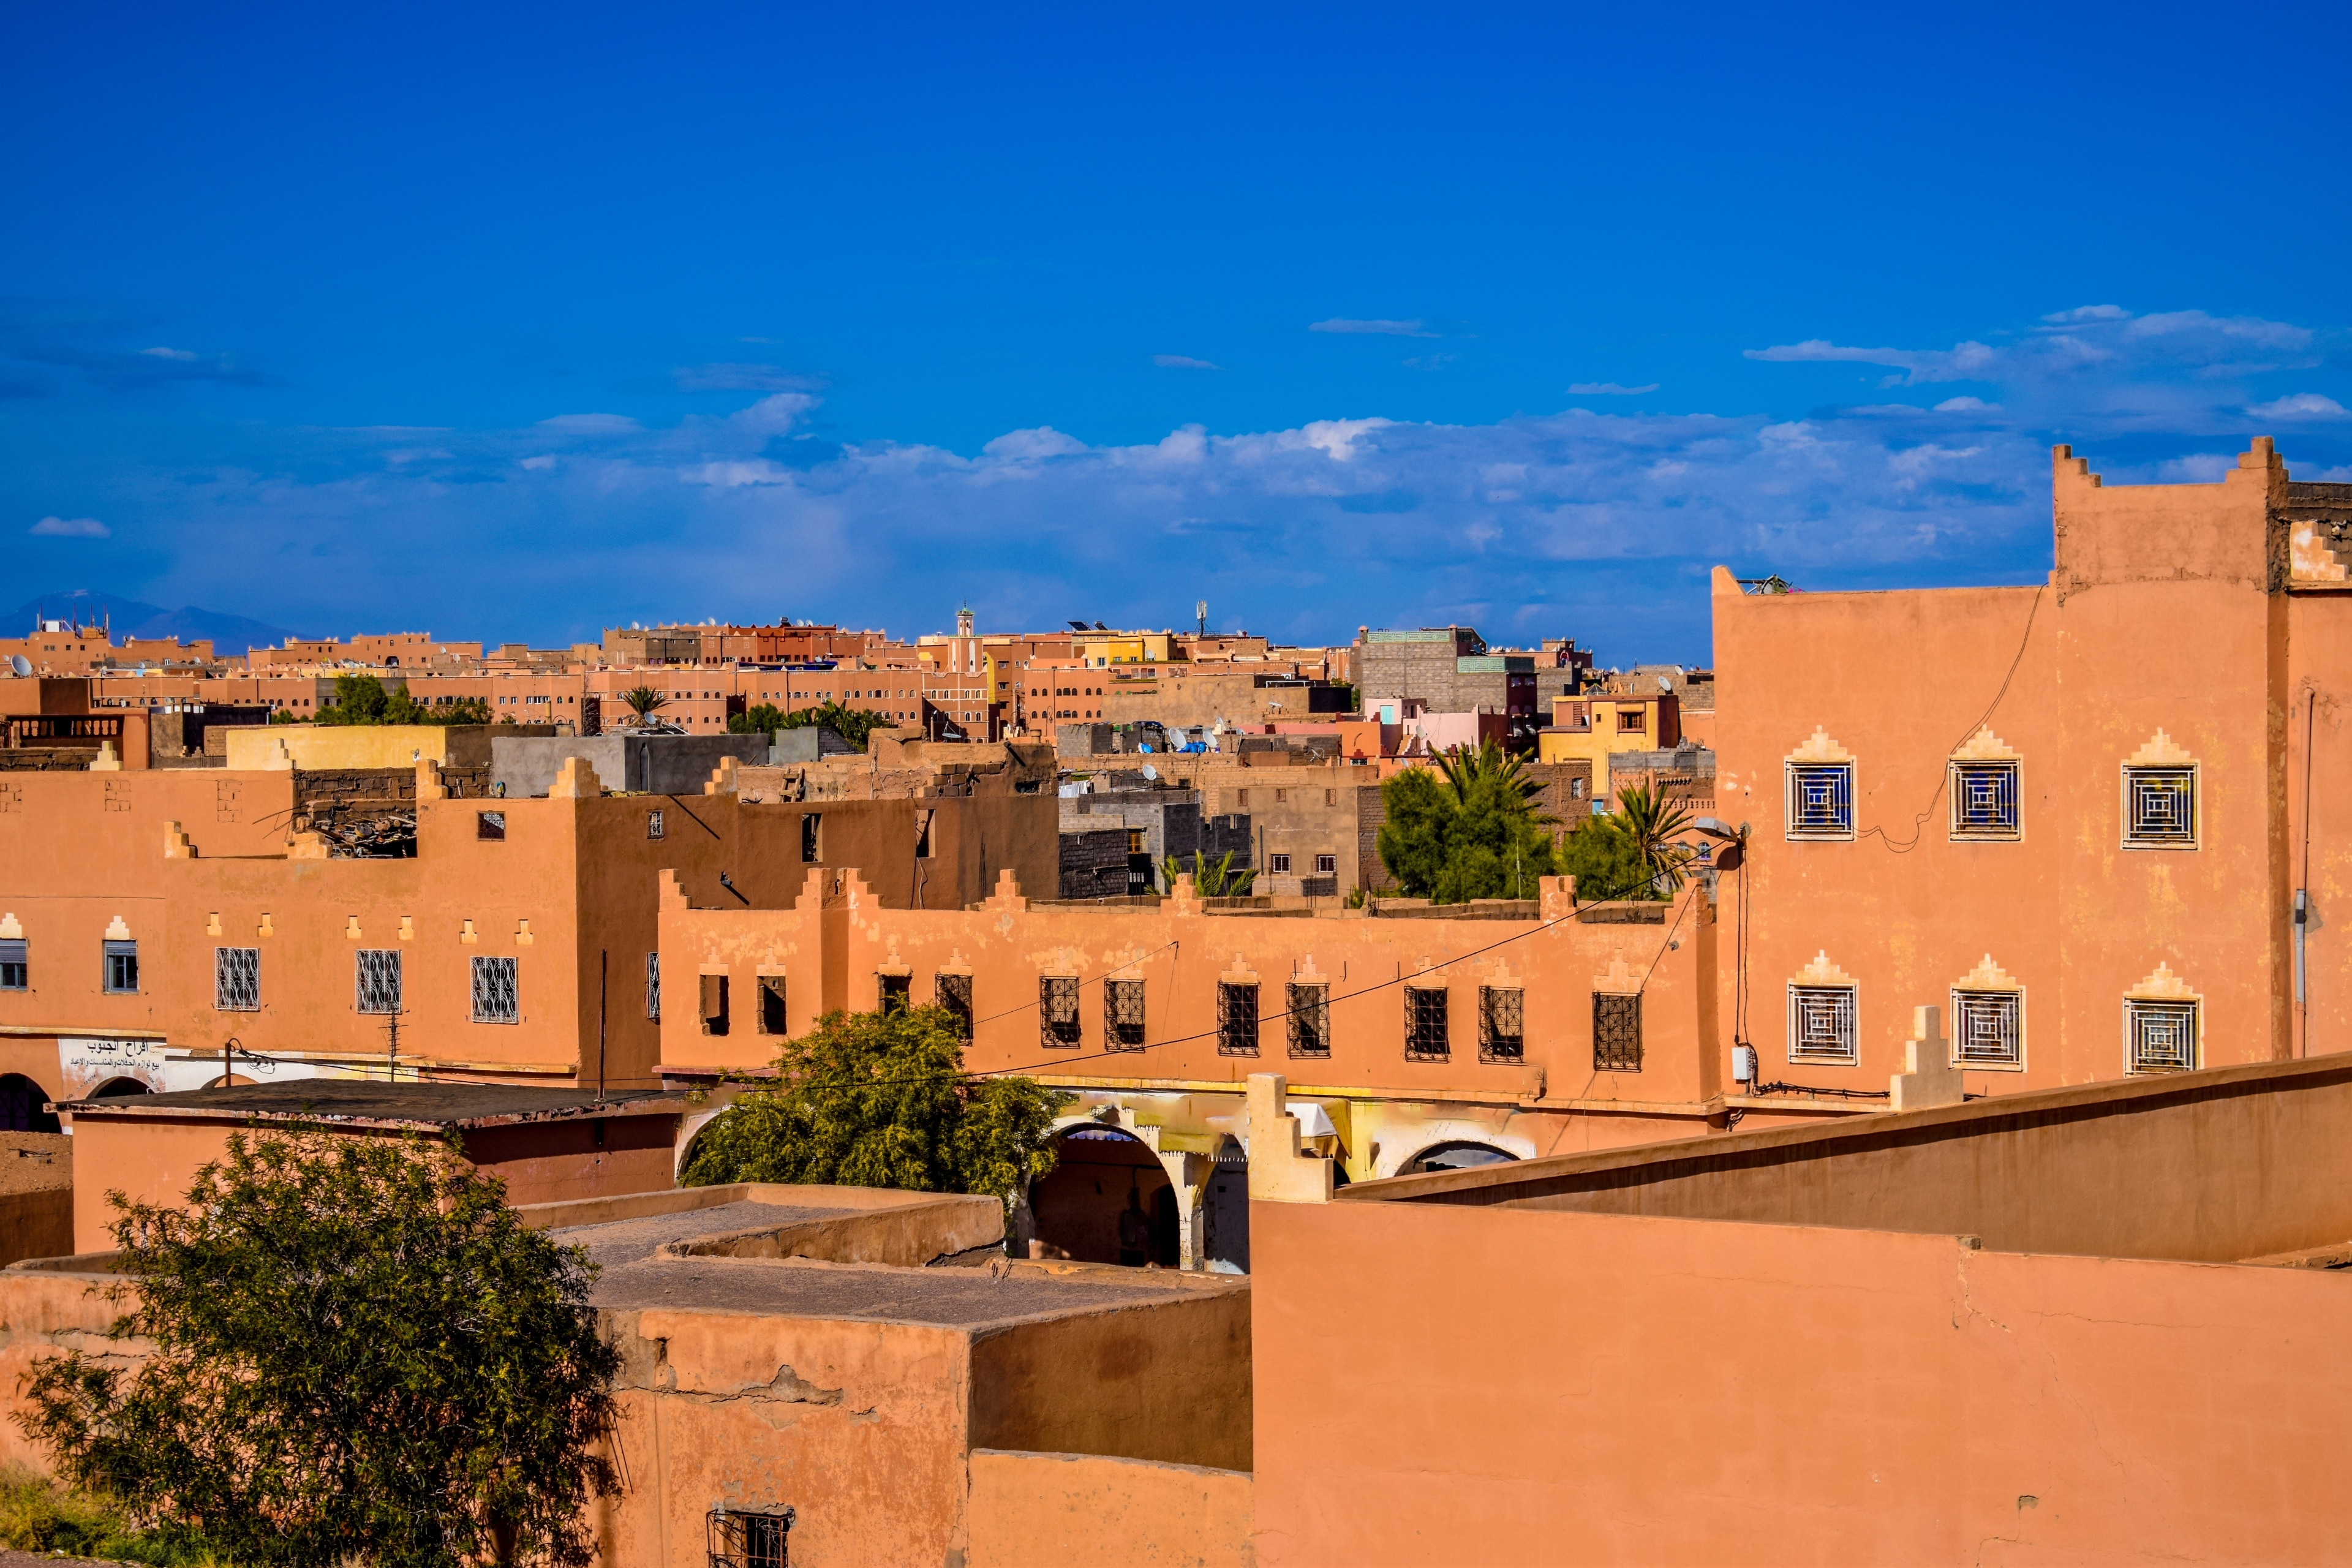 Drâa-Tafilalet, Morocco